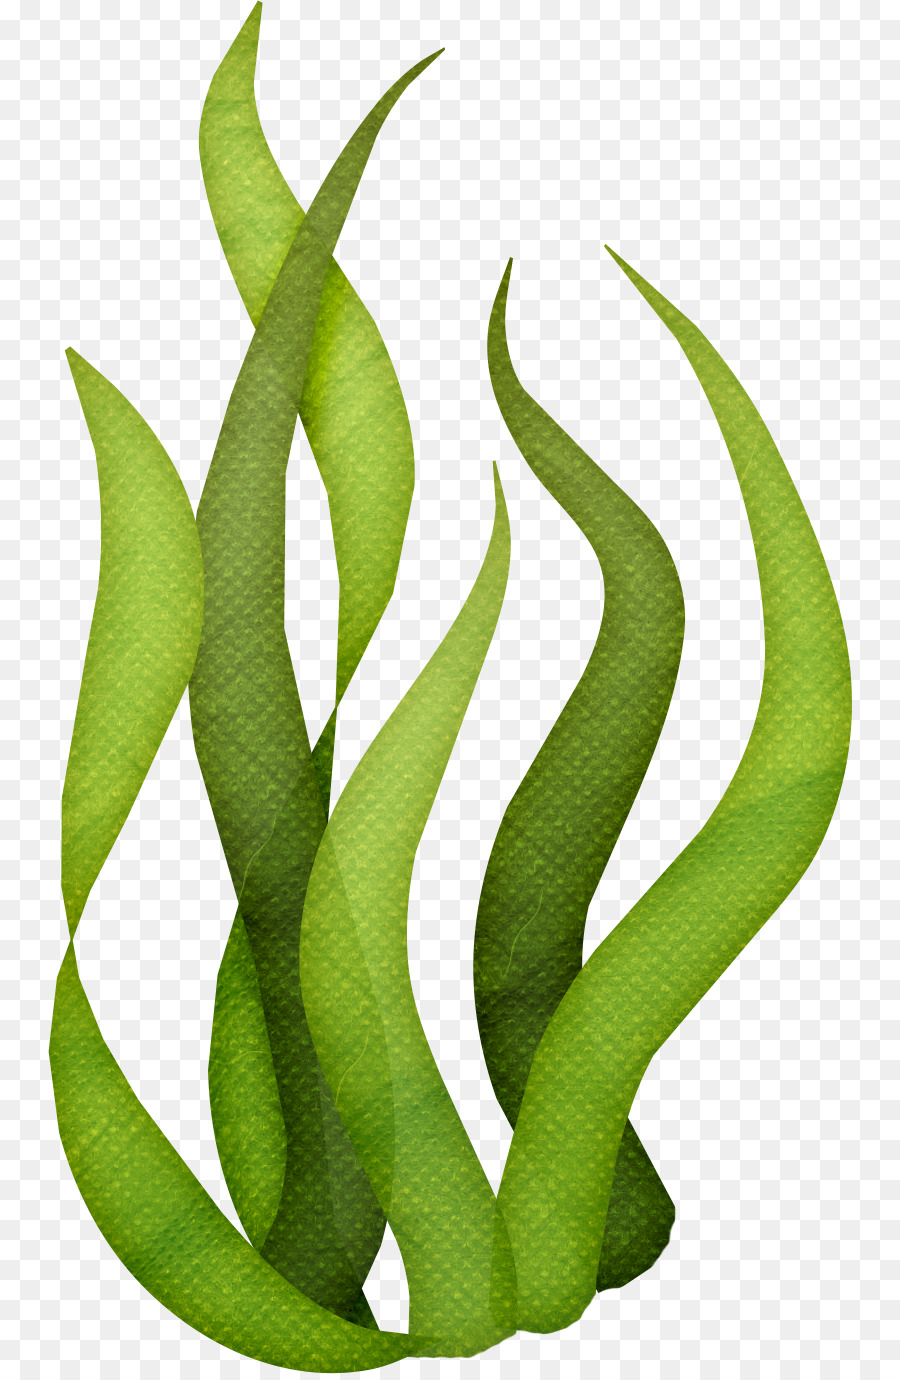 Clip art ocean png. Algae clipart seaweed